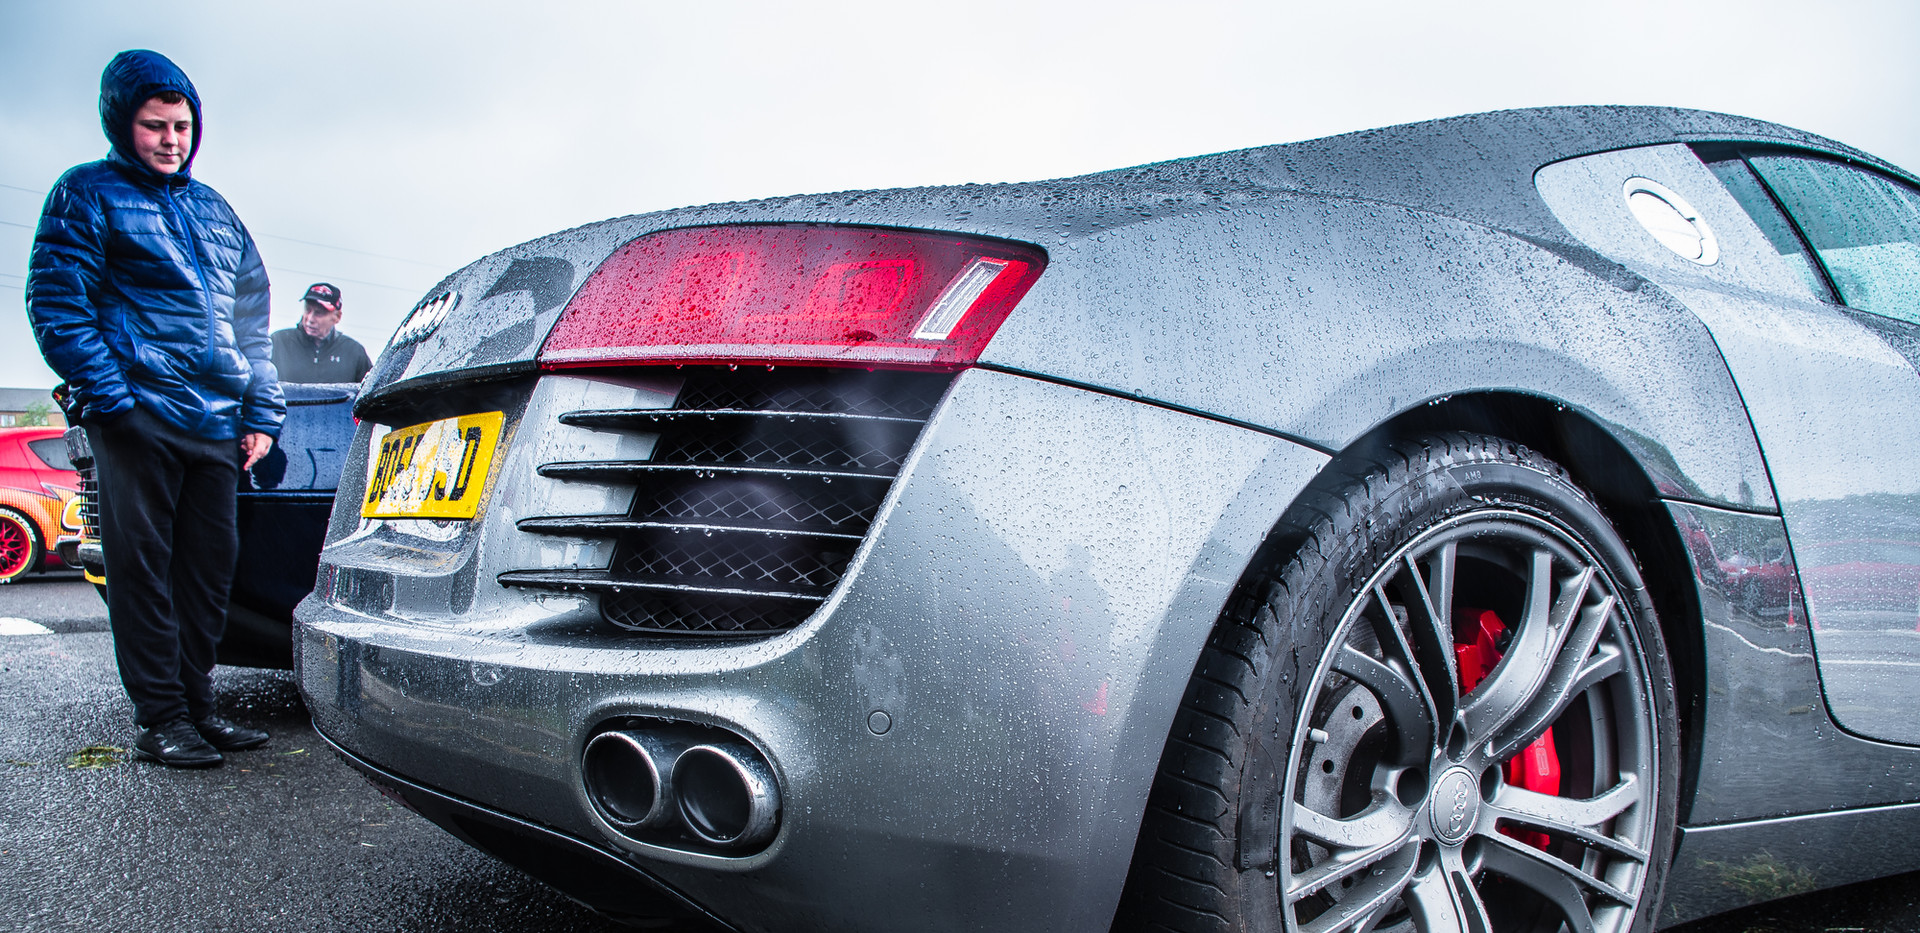 Car-tography - Child admires Audi R8.jpg